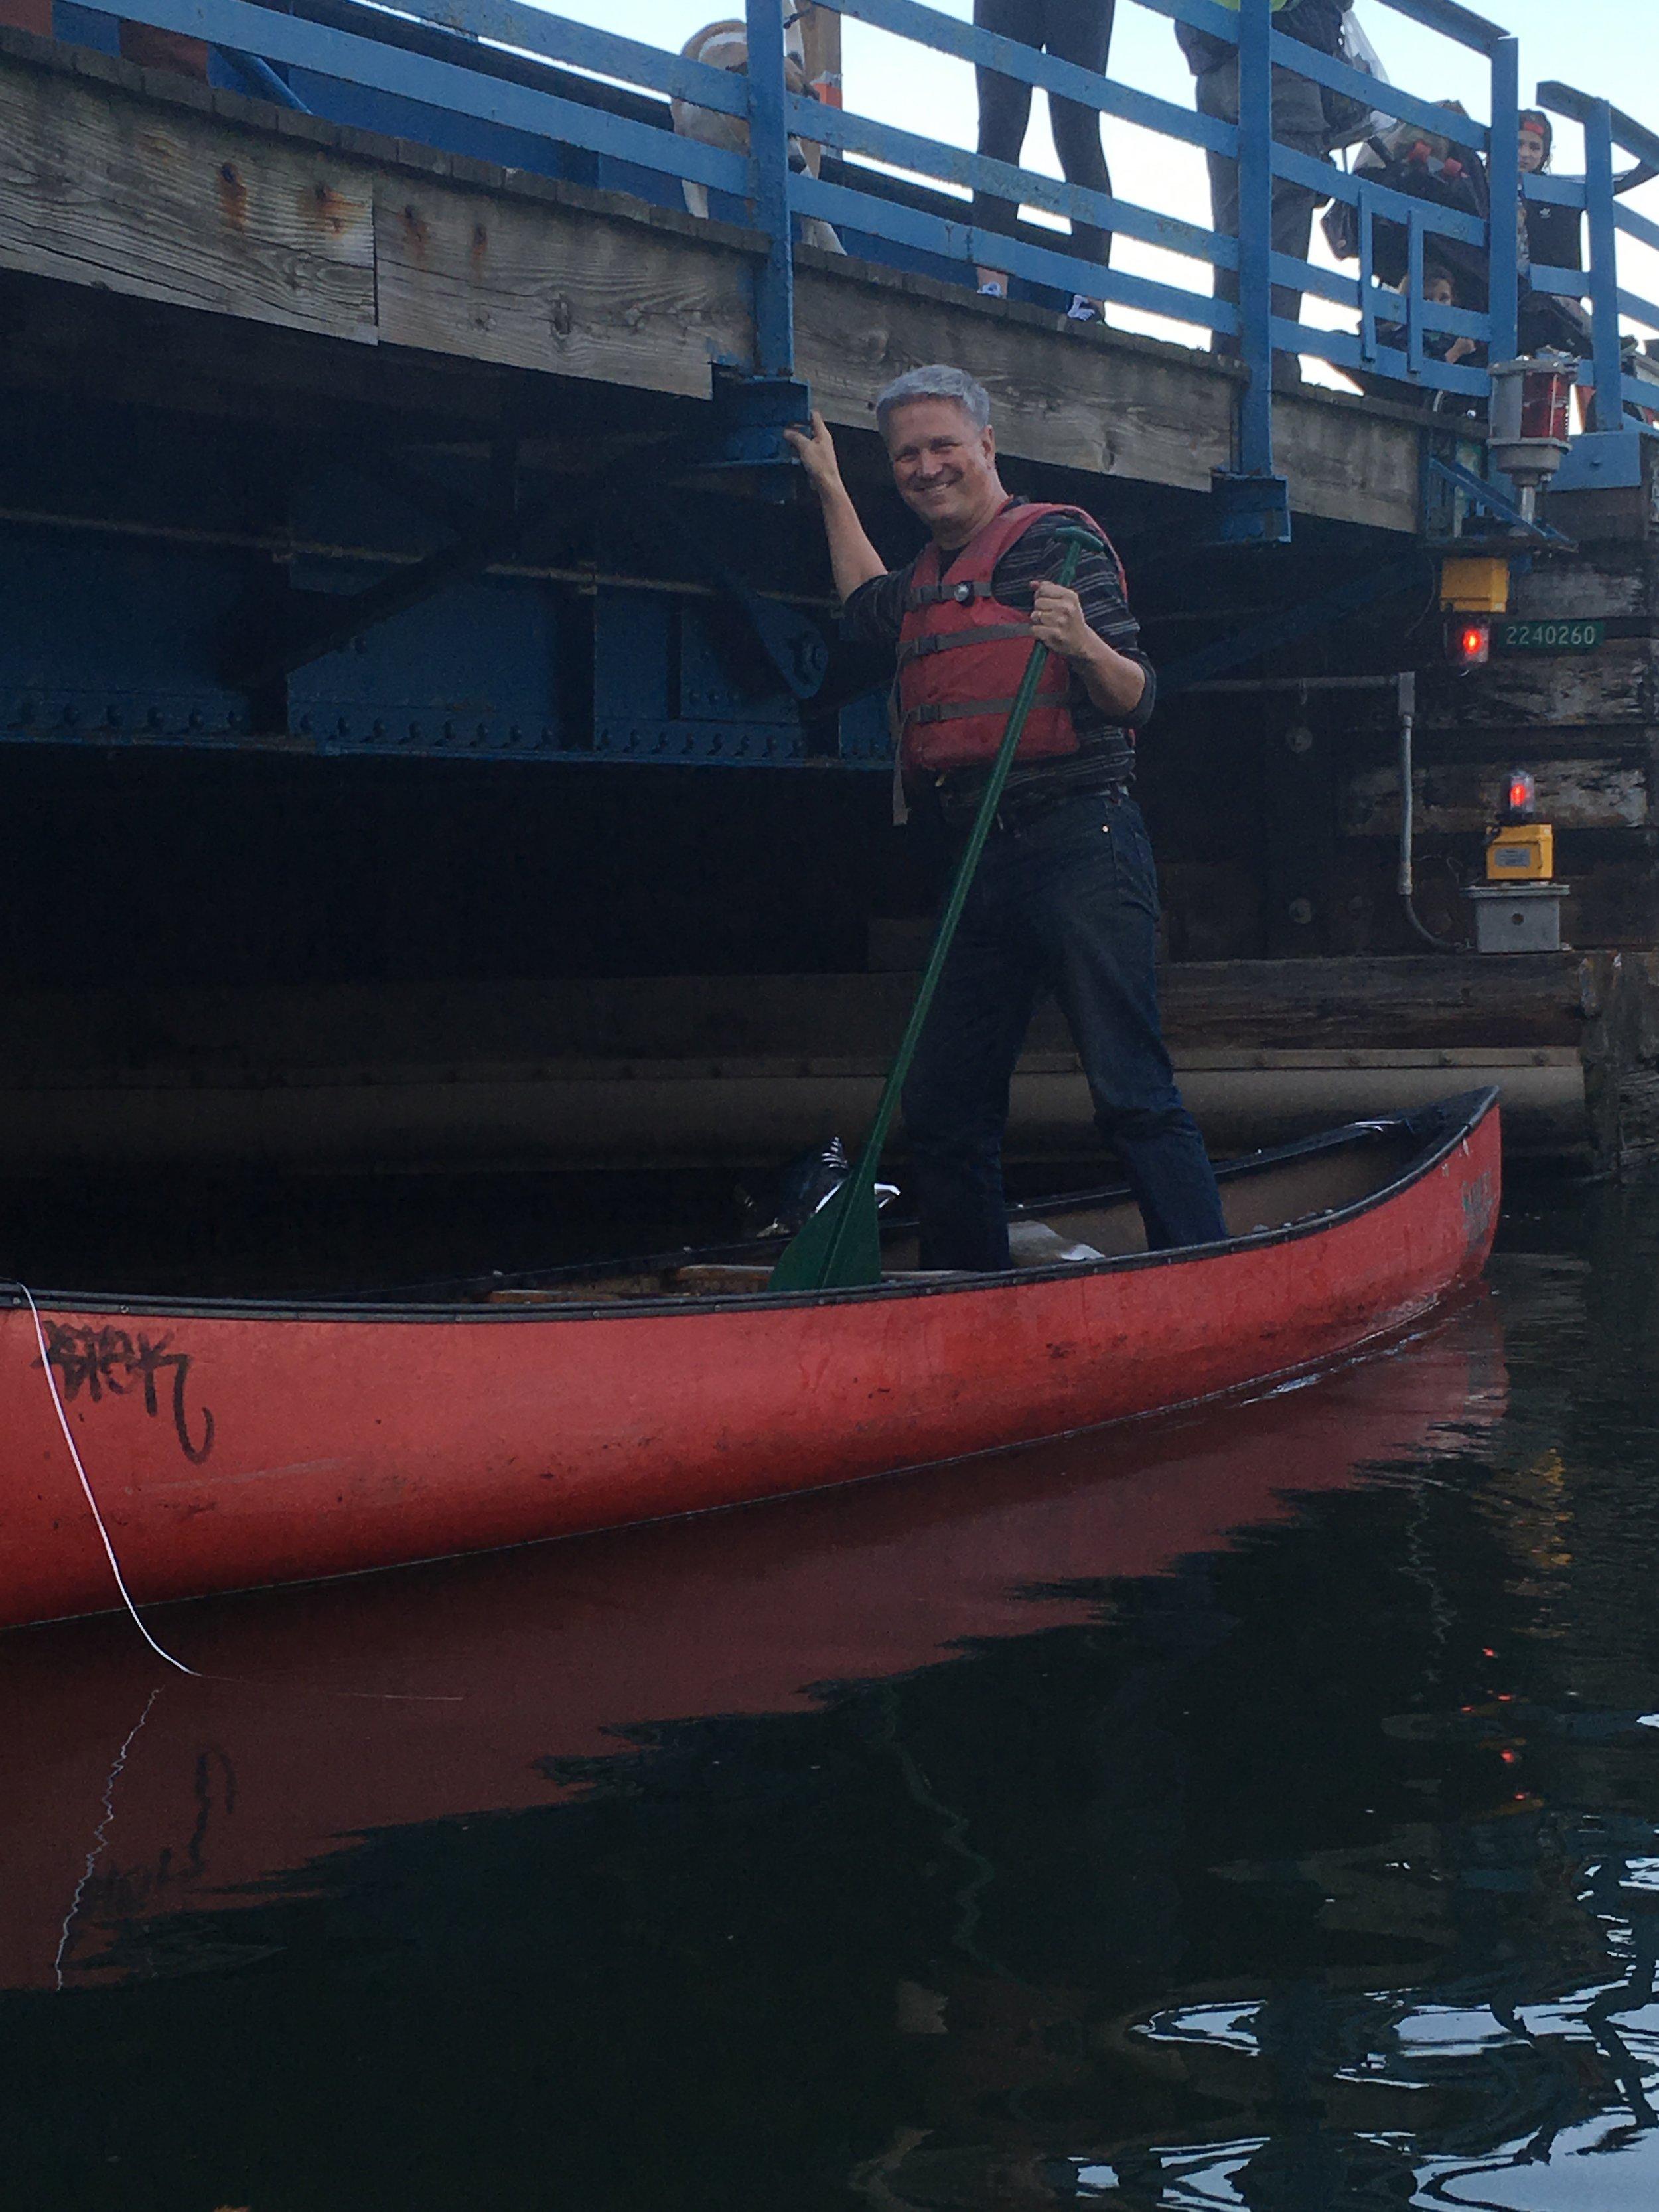 Owen captaining his canoe.